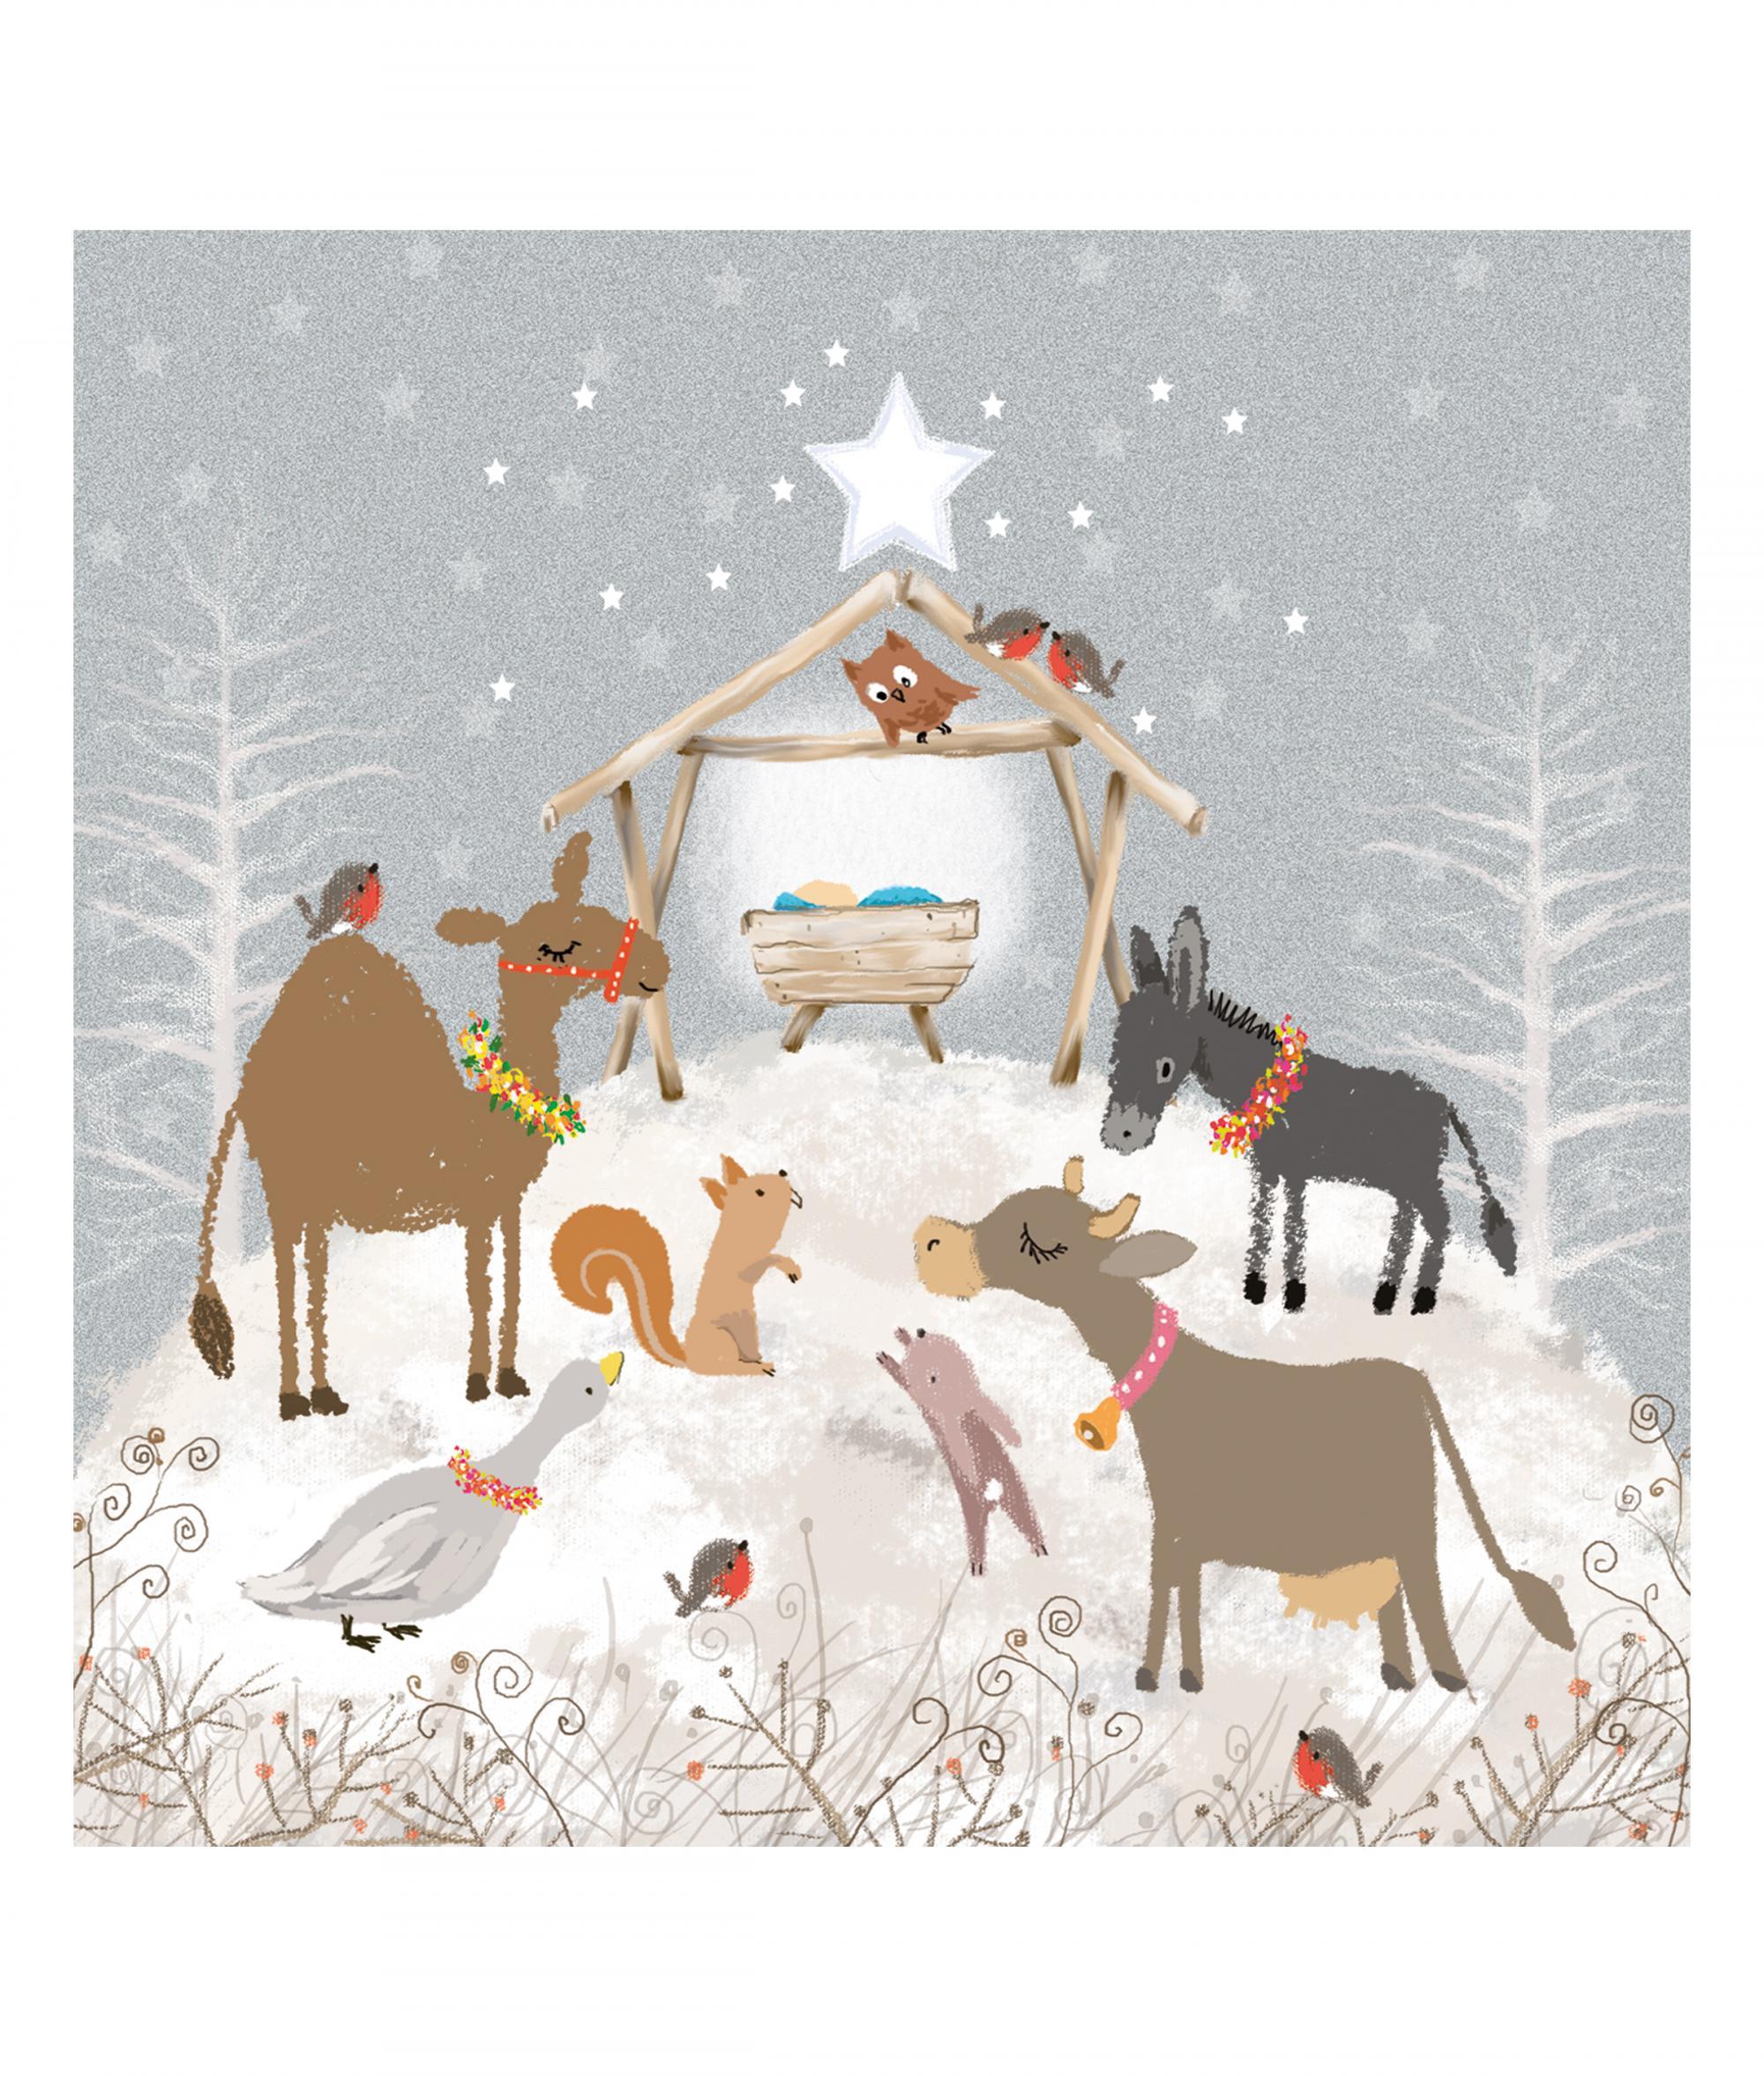 Festive Nativity Cancer Research Uk Christmas Card